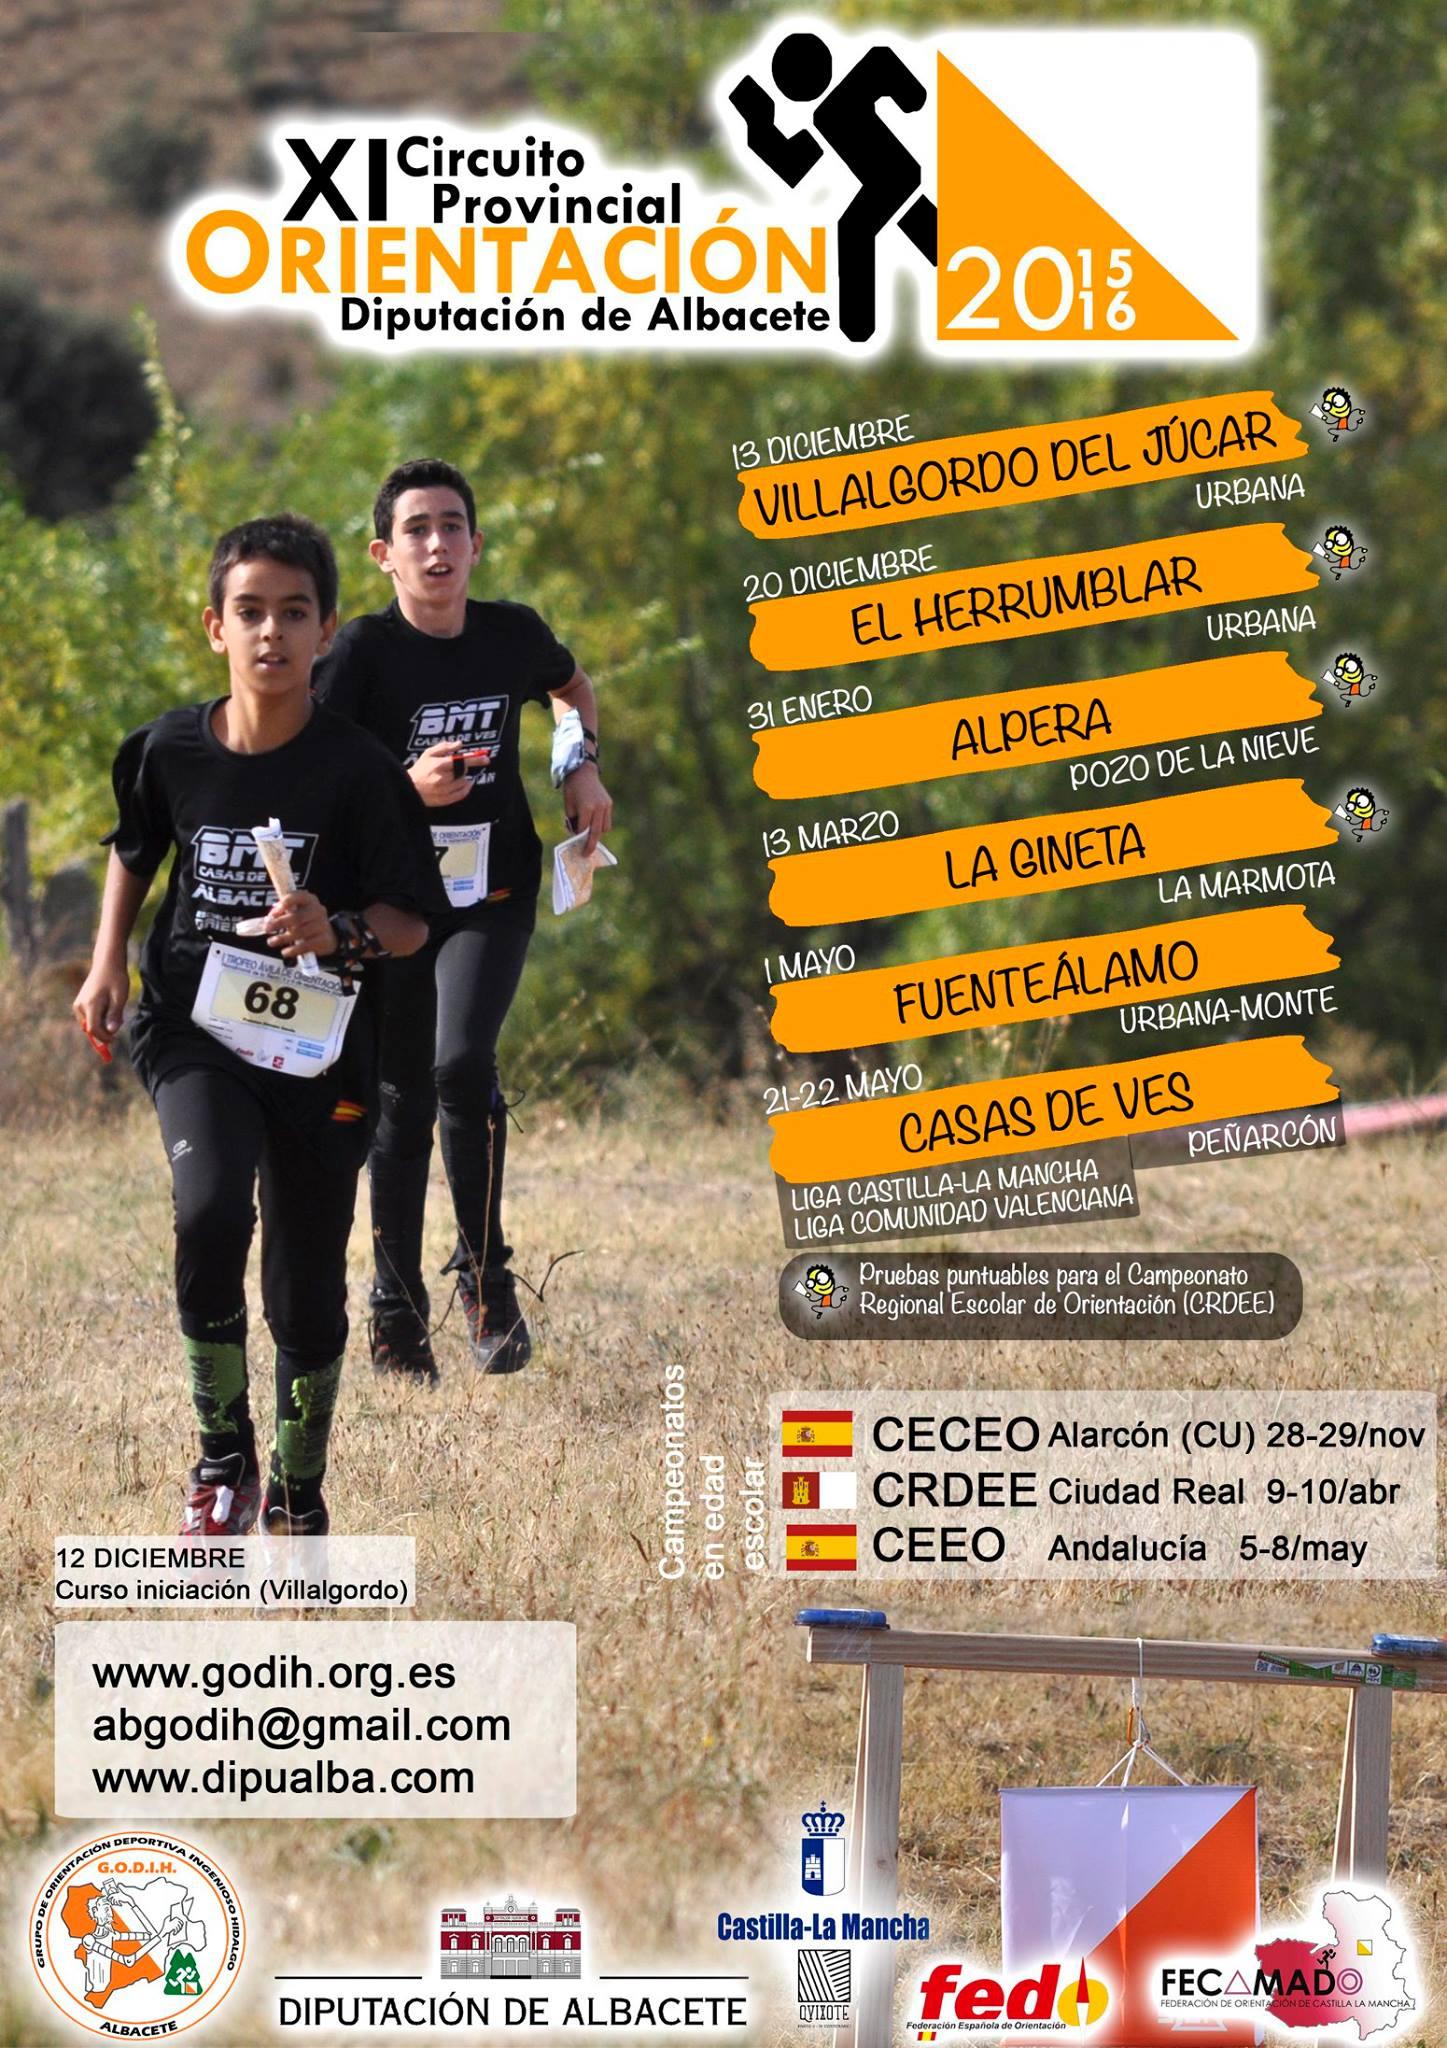 XI Circuito Provincial de Orientación Diputación de Albacete